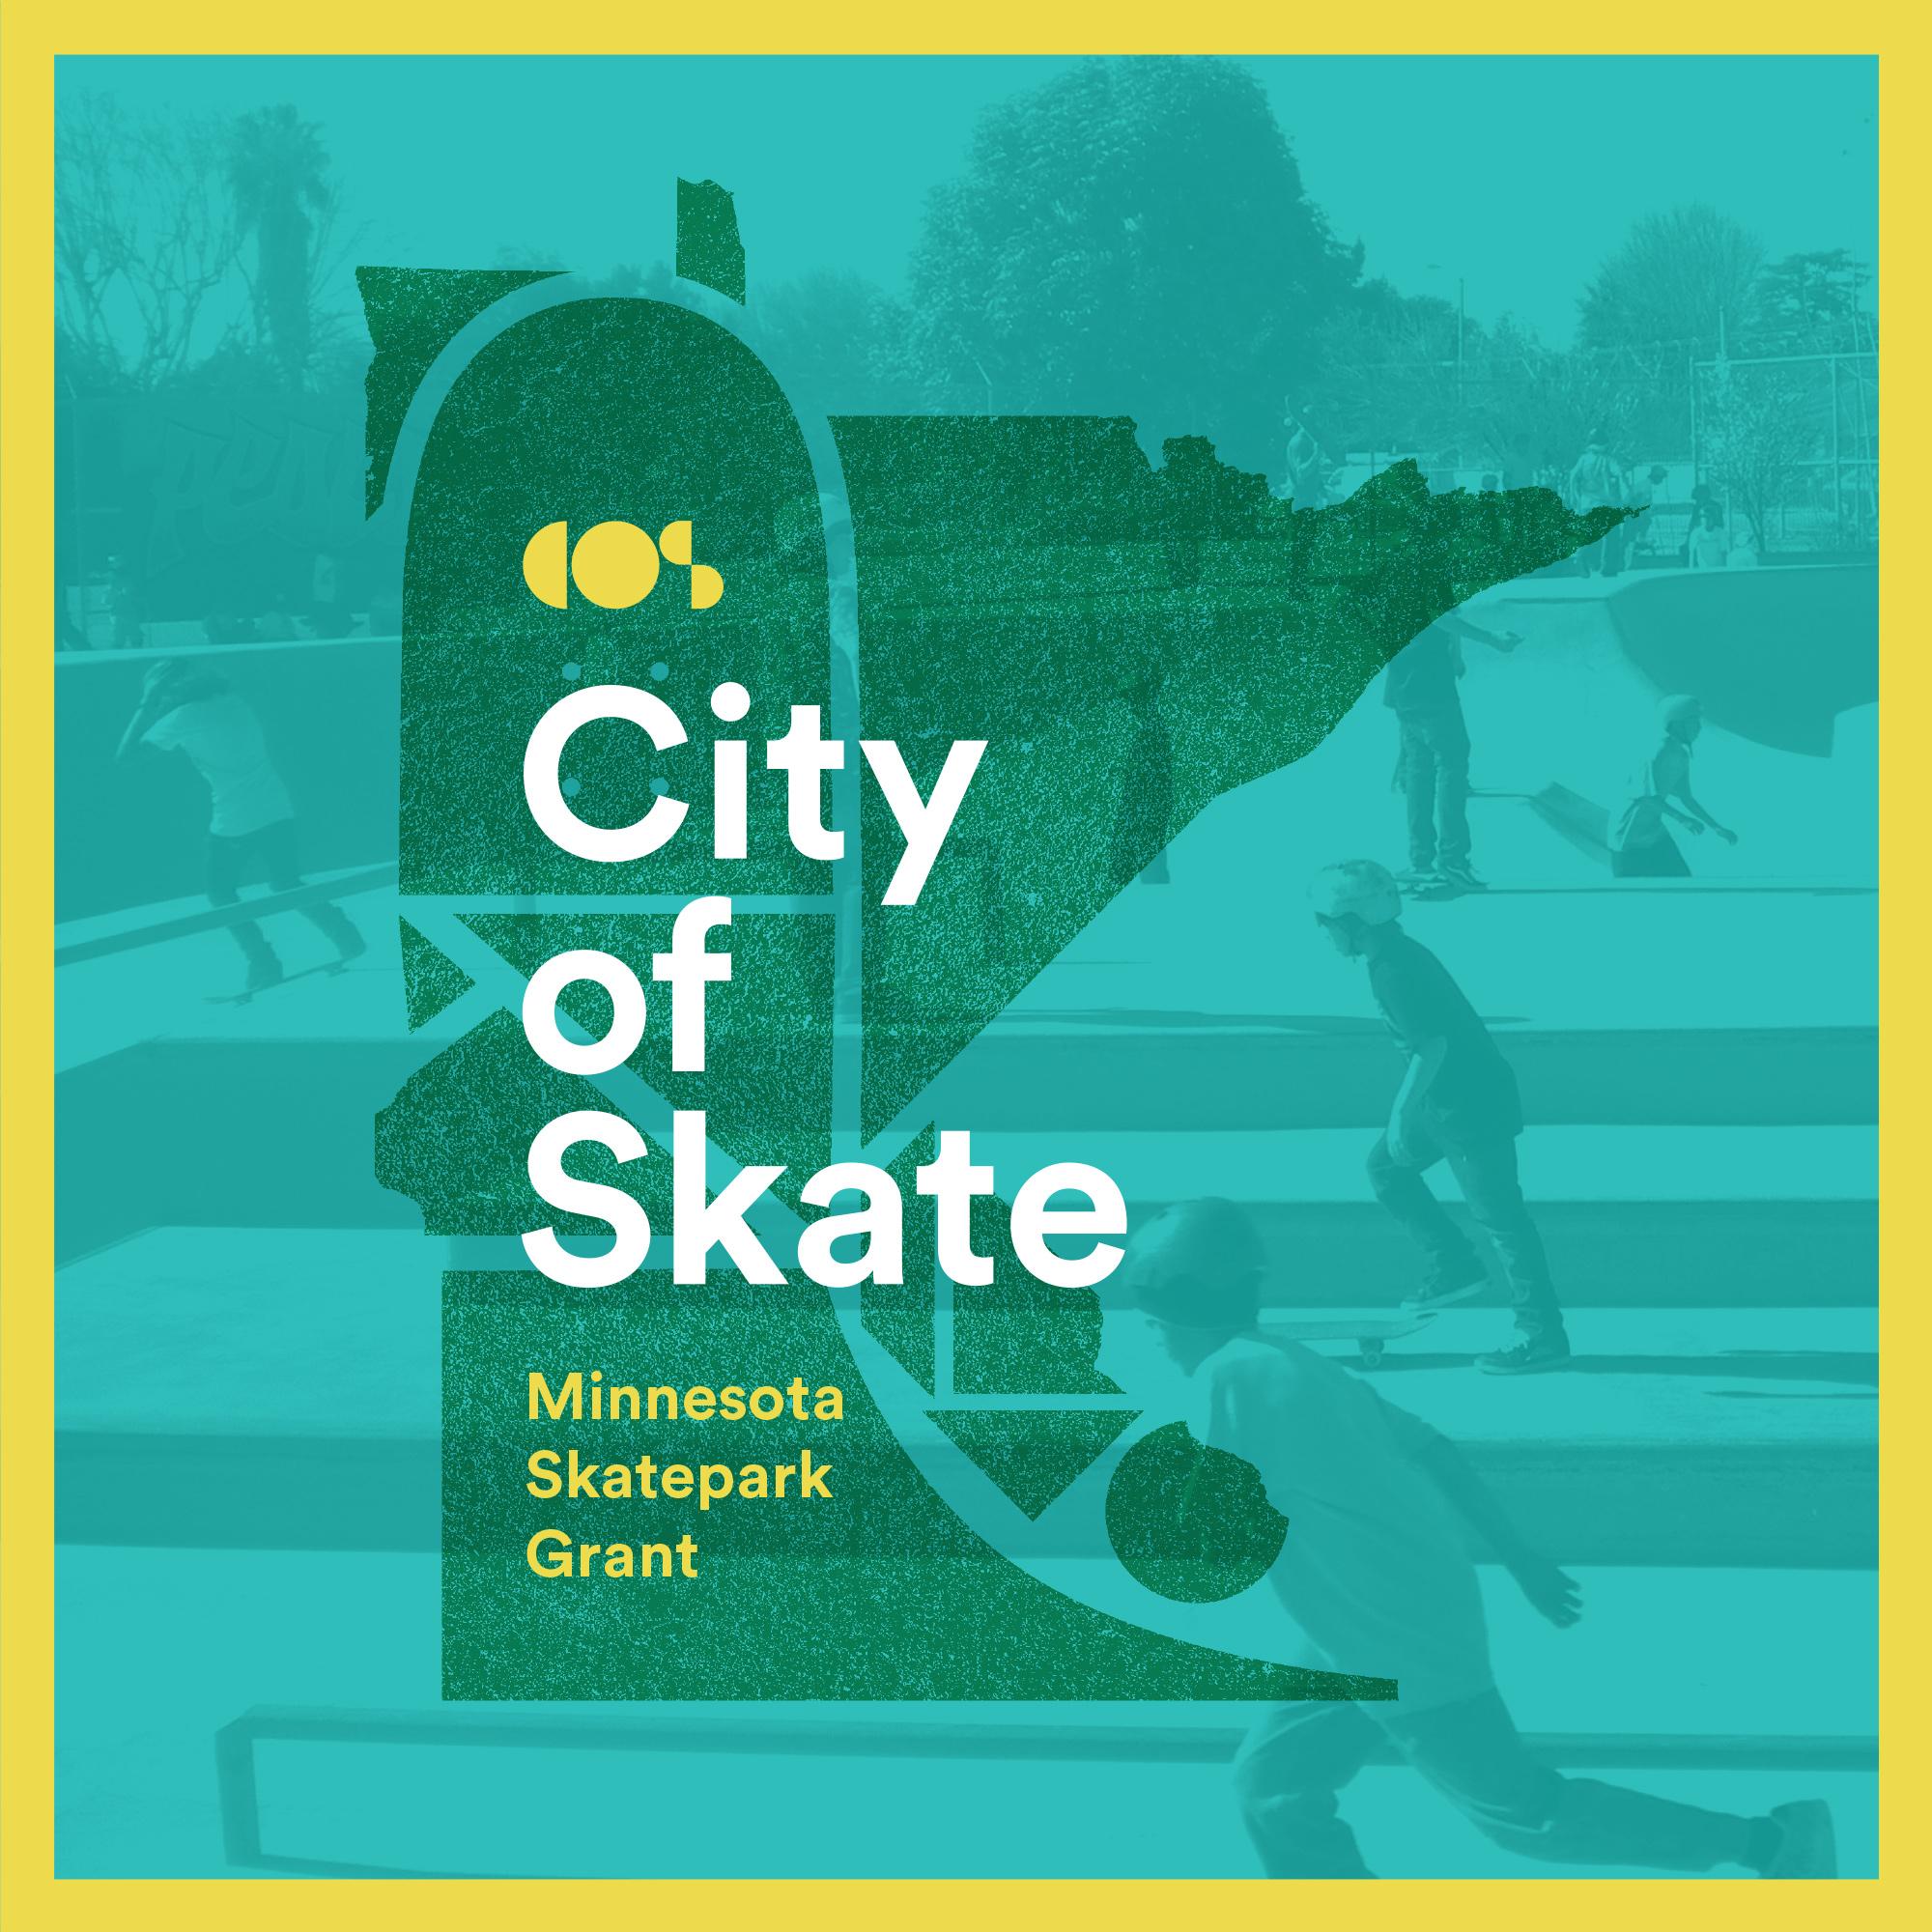 CityOfSkate-StateSkateparkGrant-2019.jpg